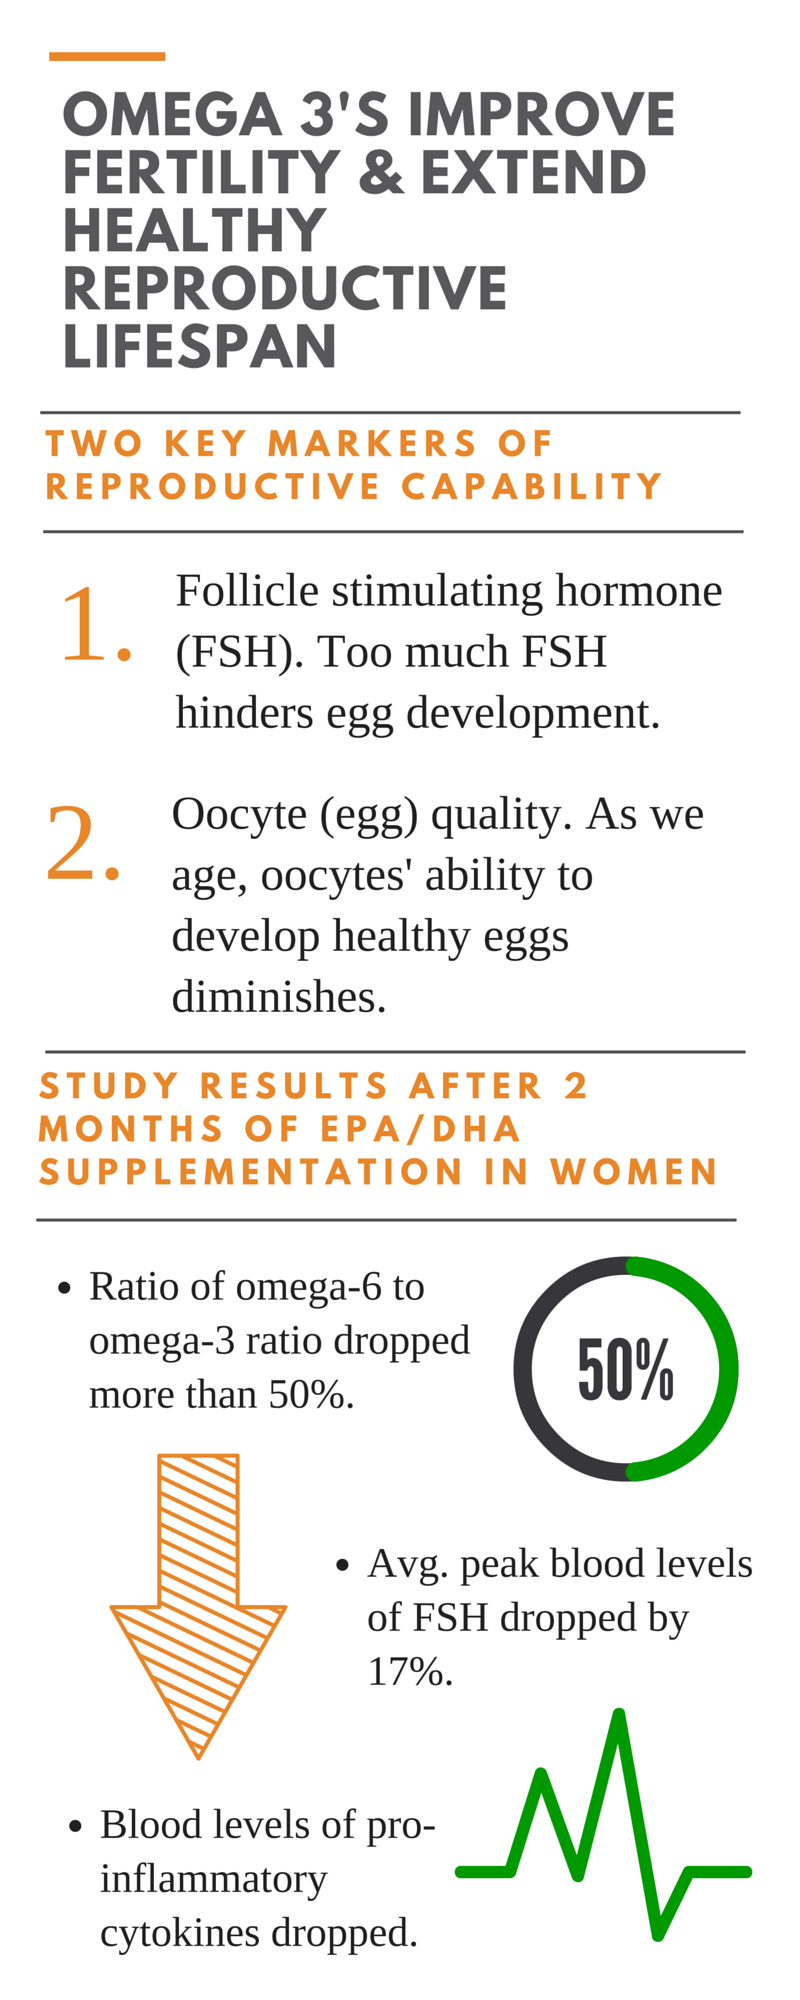 Omega 3's Improve Fertility & Extend Healthy Reproductive Lifestpan (1)